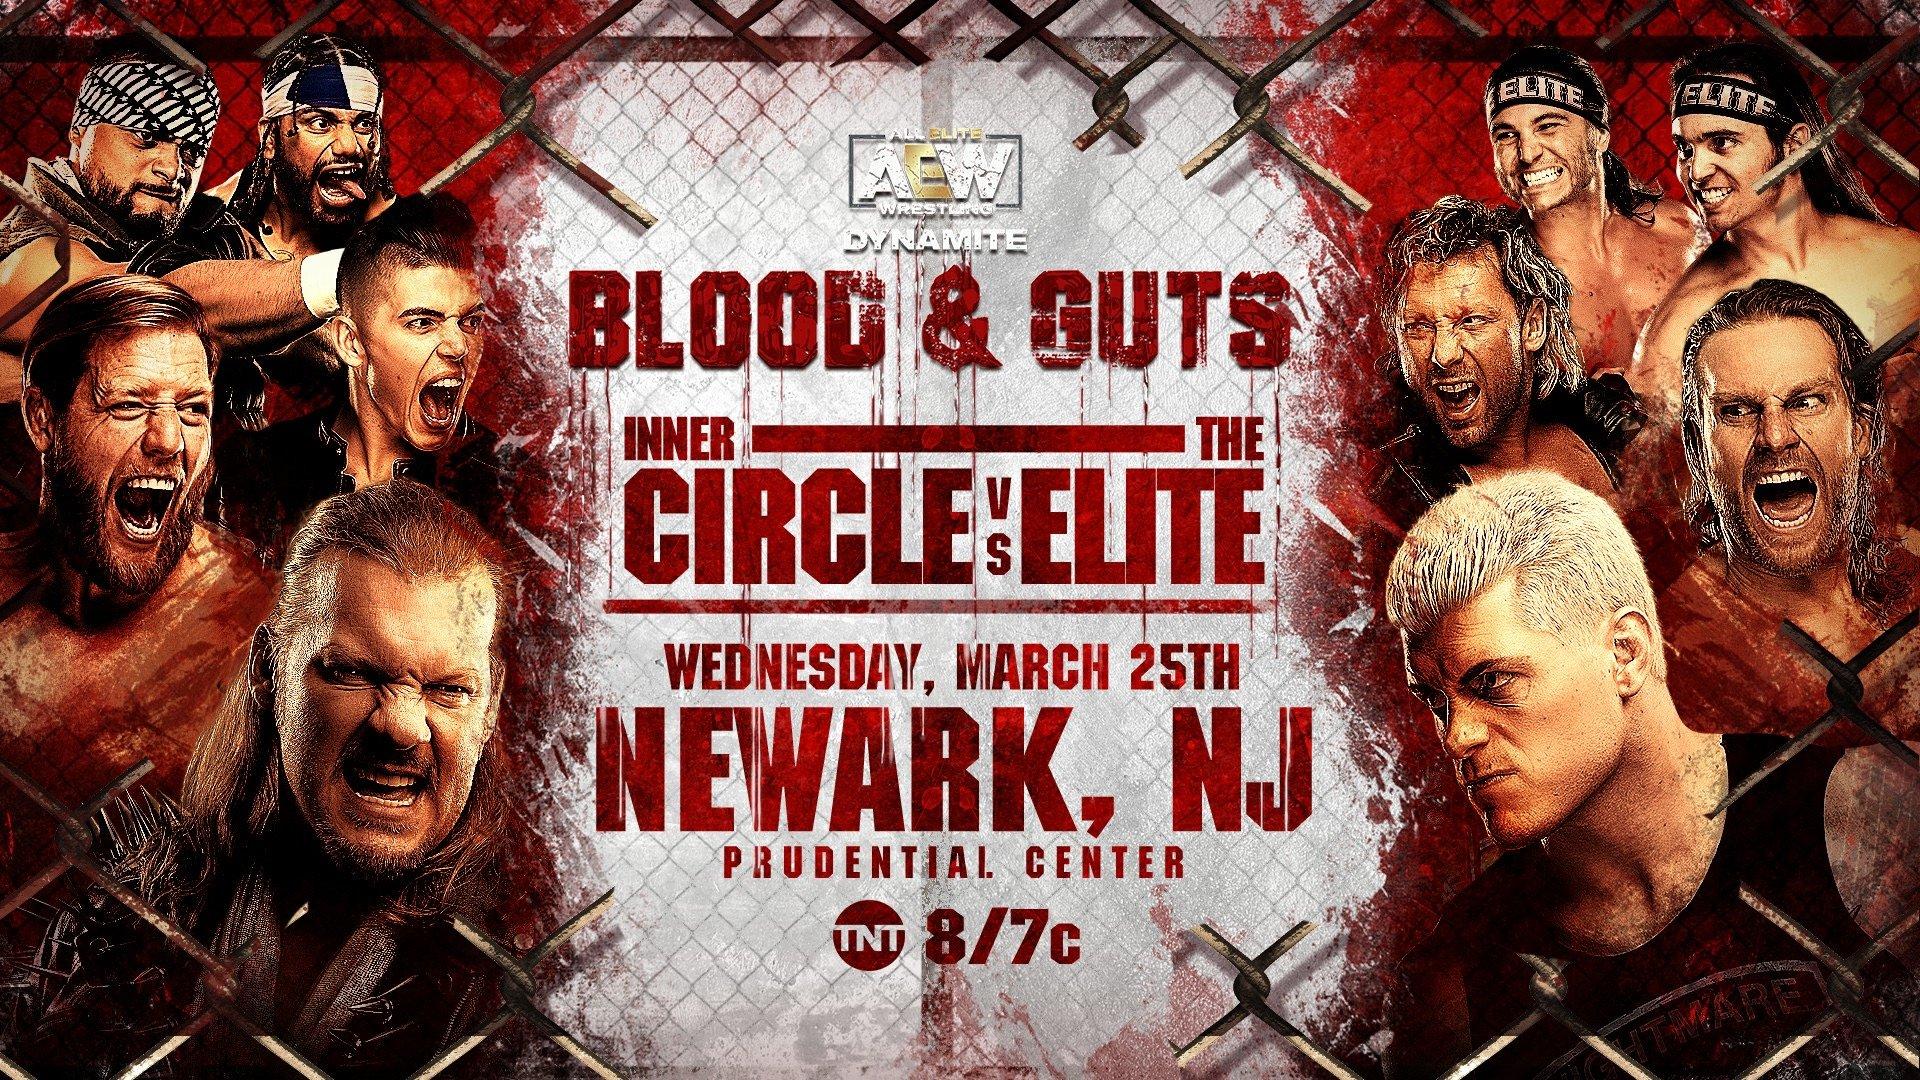 aew-blood-guts-cage-match.jpg